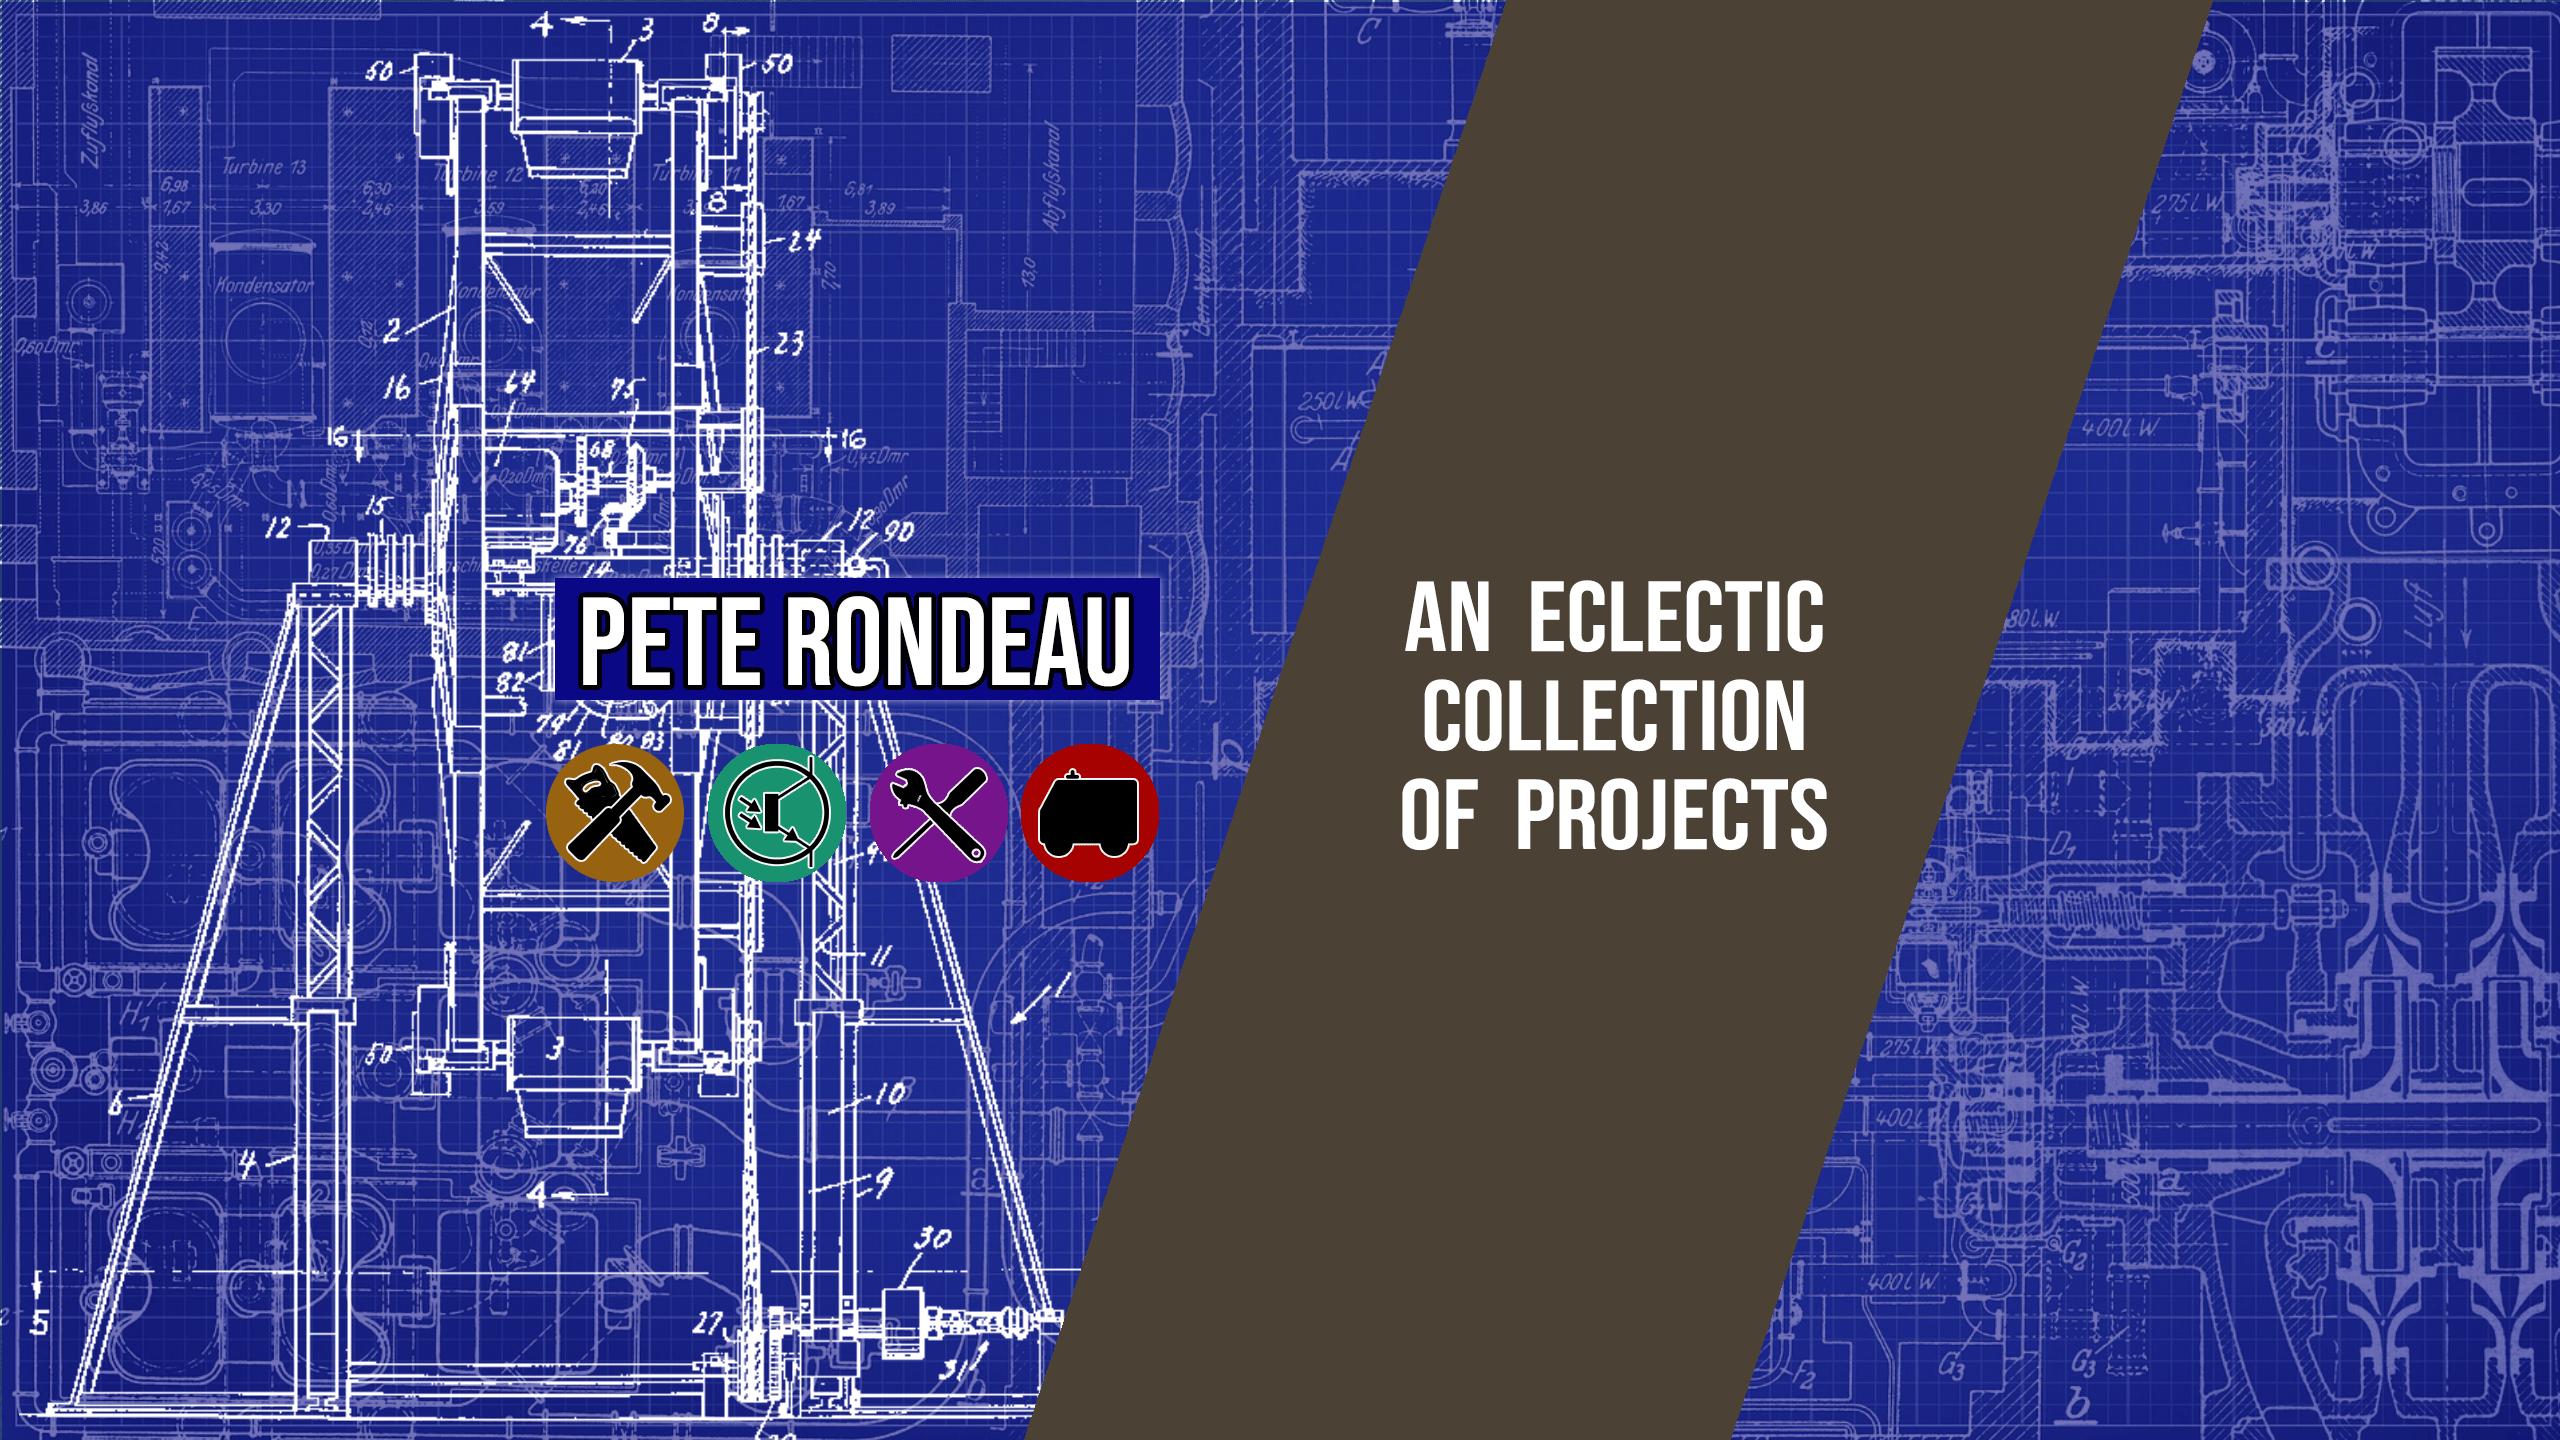 Pete Rondeau Channel Art